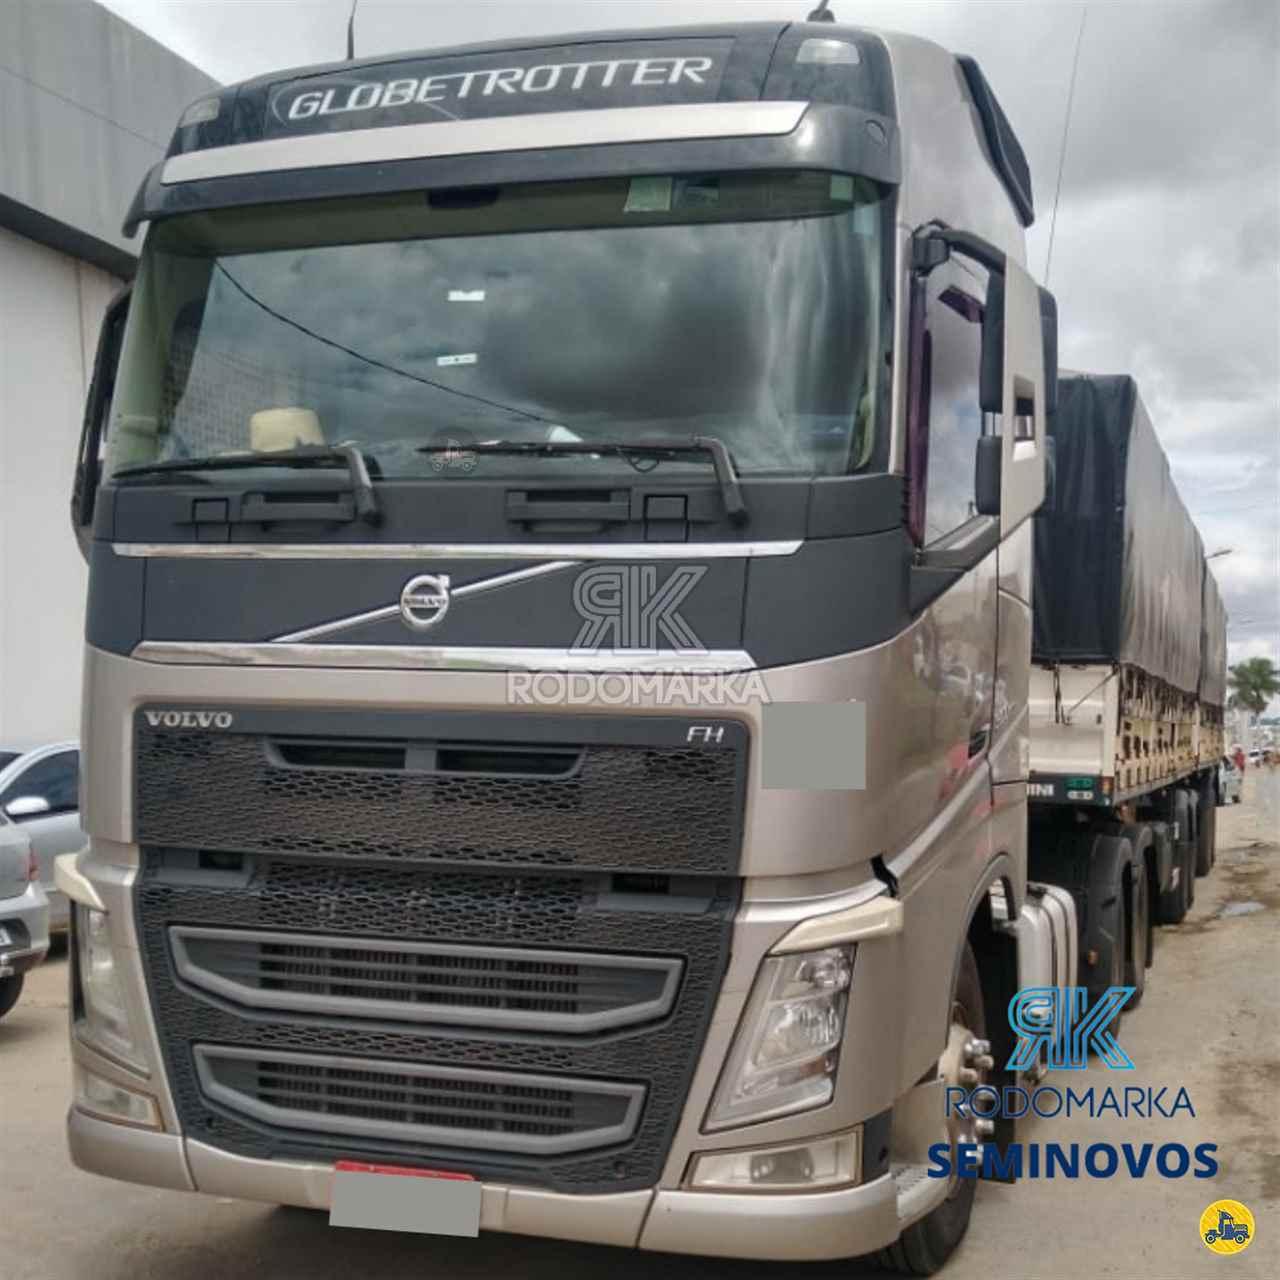 CAMINHAO VOLVO VOLVO FH 500 Chassis Truck 6x2 Rodomarka Implementos Rodoviários - Librelato MARINGA PARANÁ PR